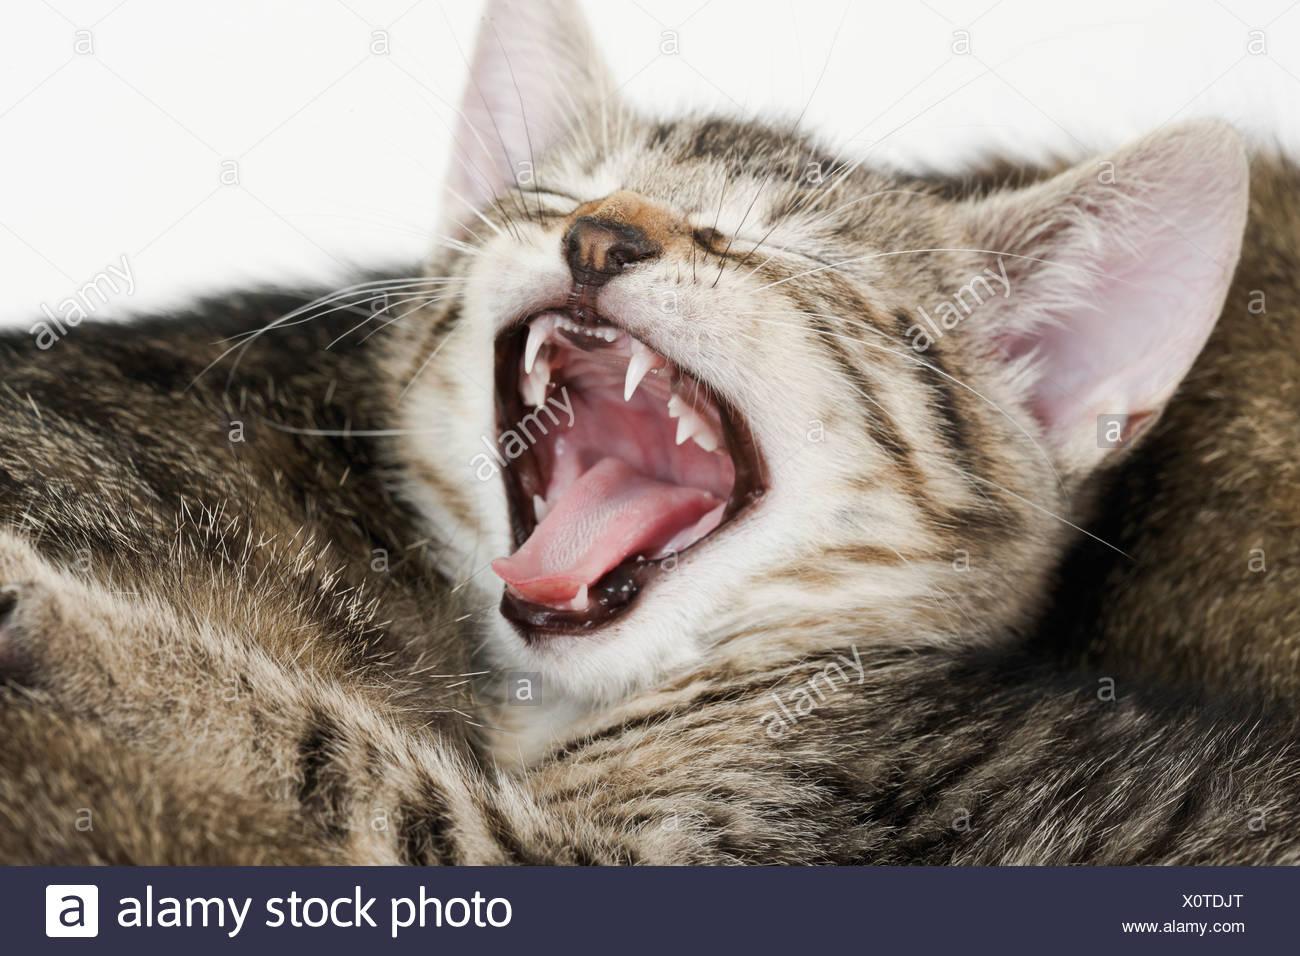 Domestic cat, kitten yawning, portrait, close-up - Stock Image